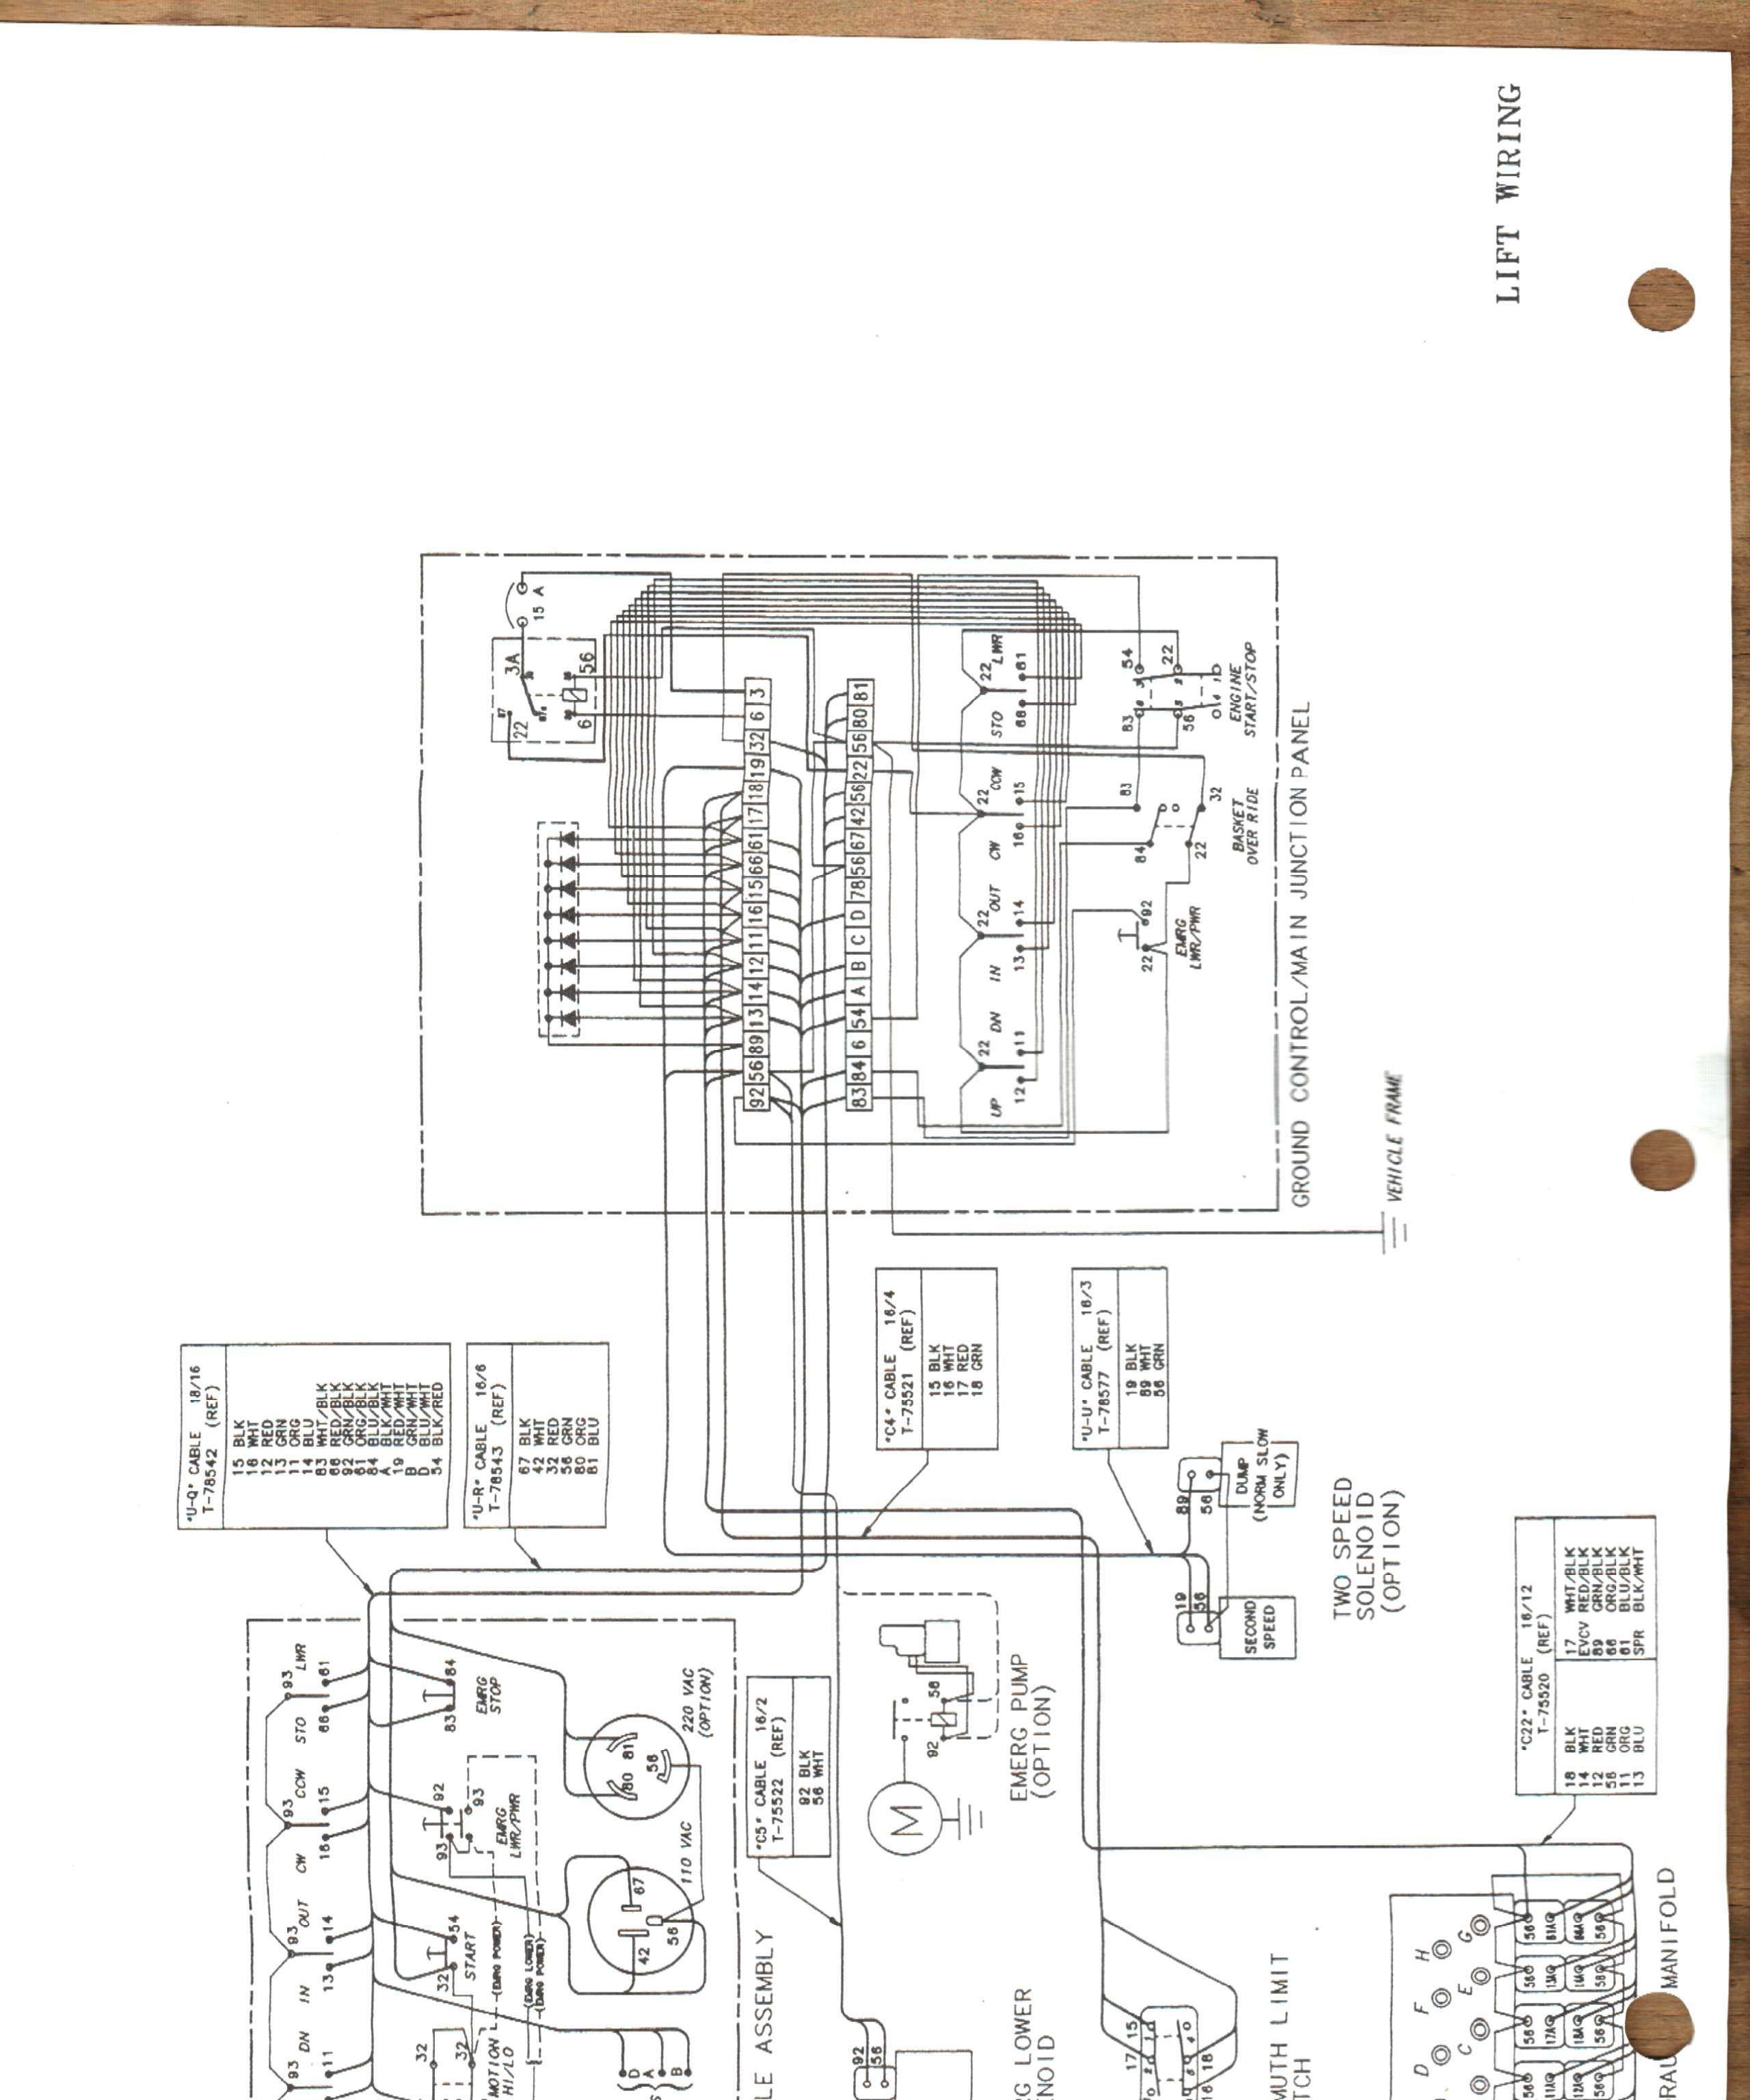 medium resolution of wiring diagram cars trucks wiring diagram cars trucks truck horn wiring wiring diagrams